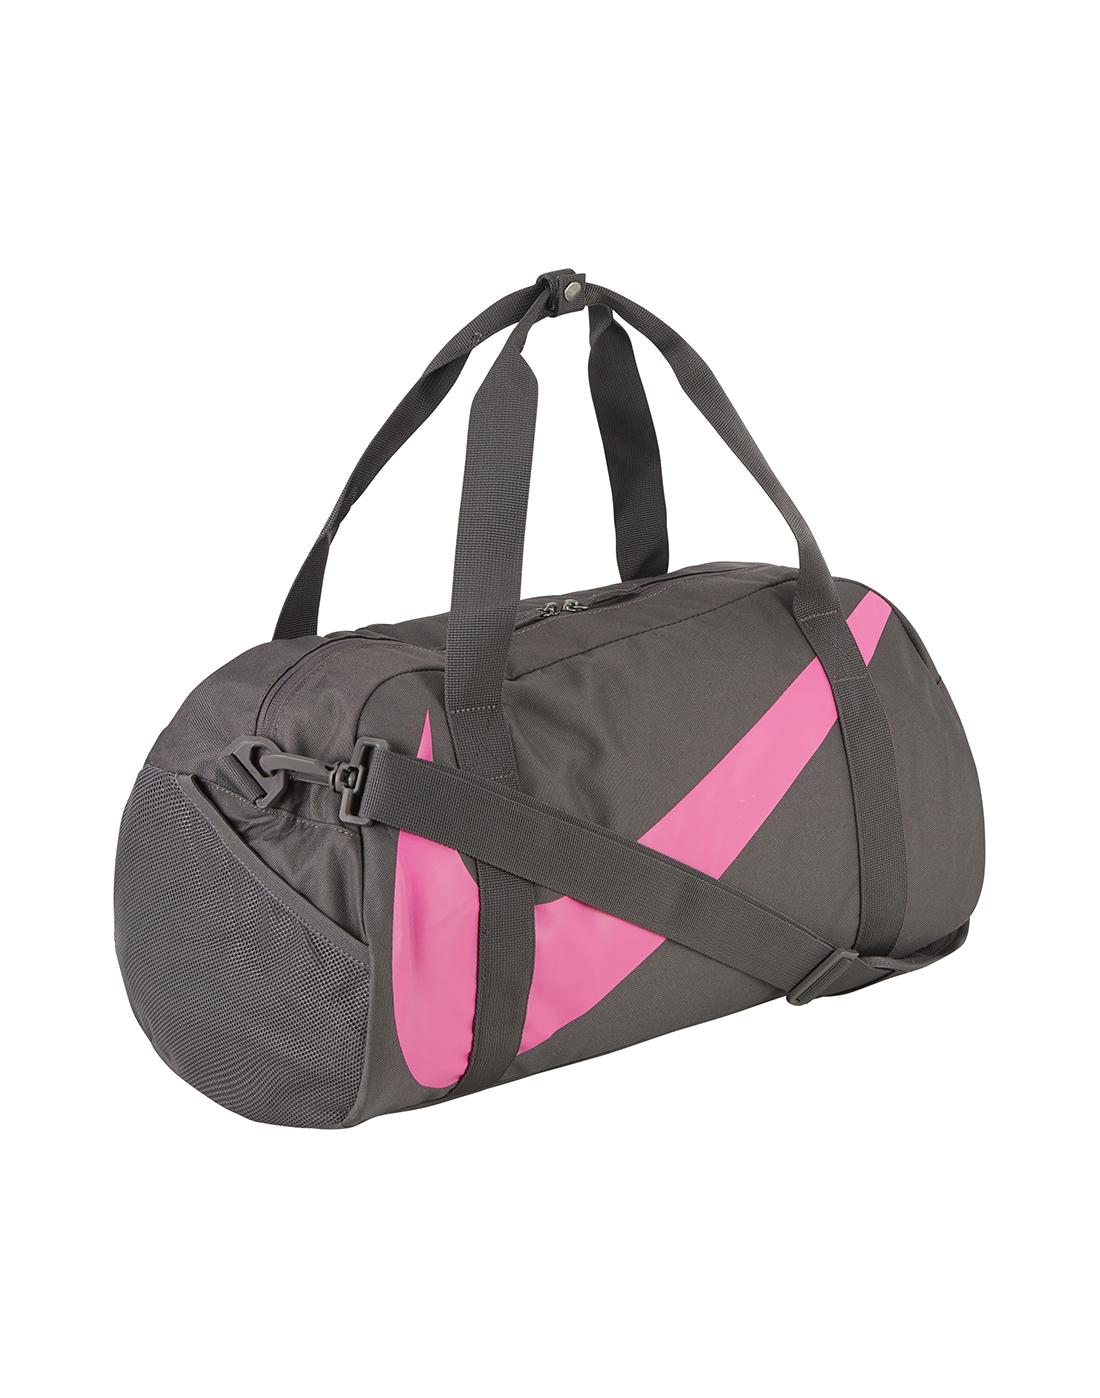 12146e723d1d7c Nike Gym Club Duffel Bag | Life Style Sports